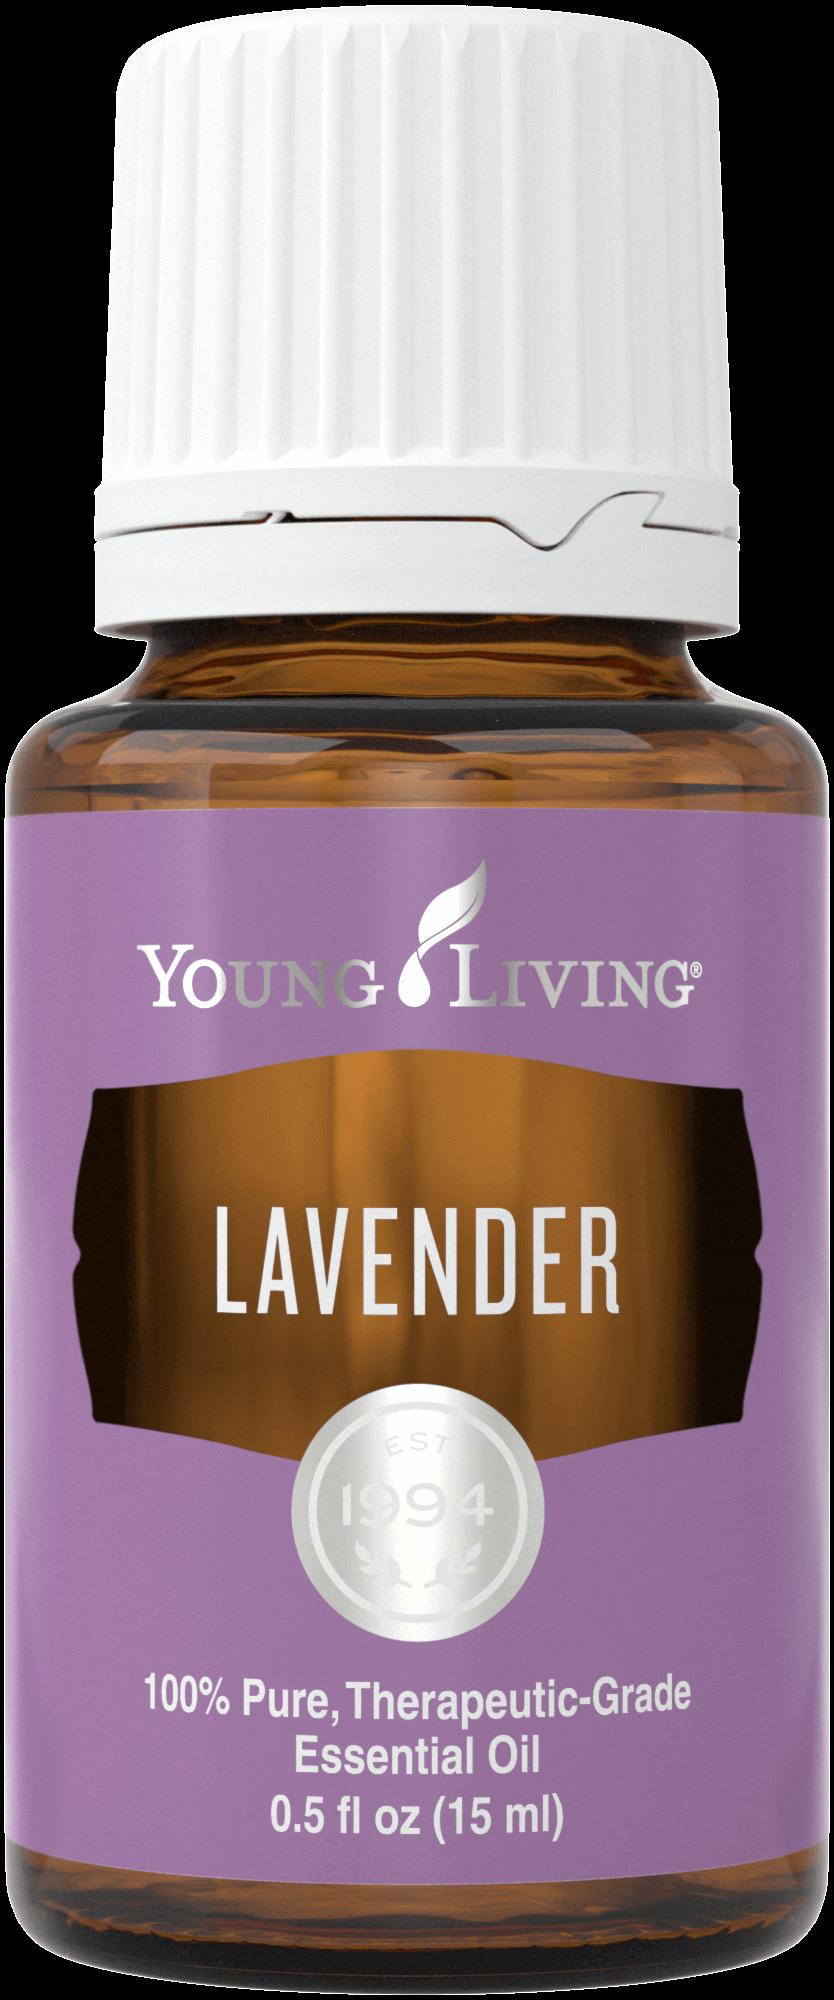 Lavendel 15ml